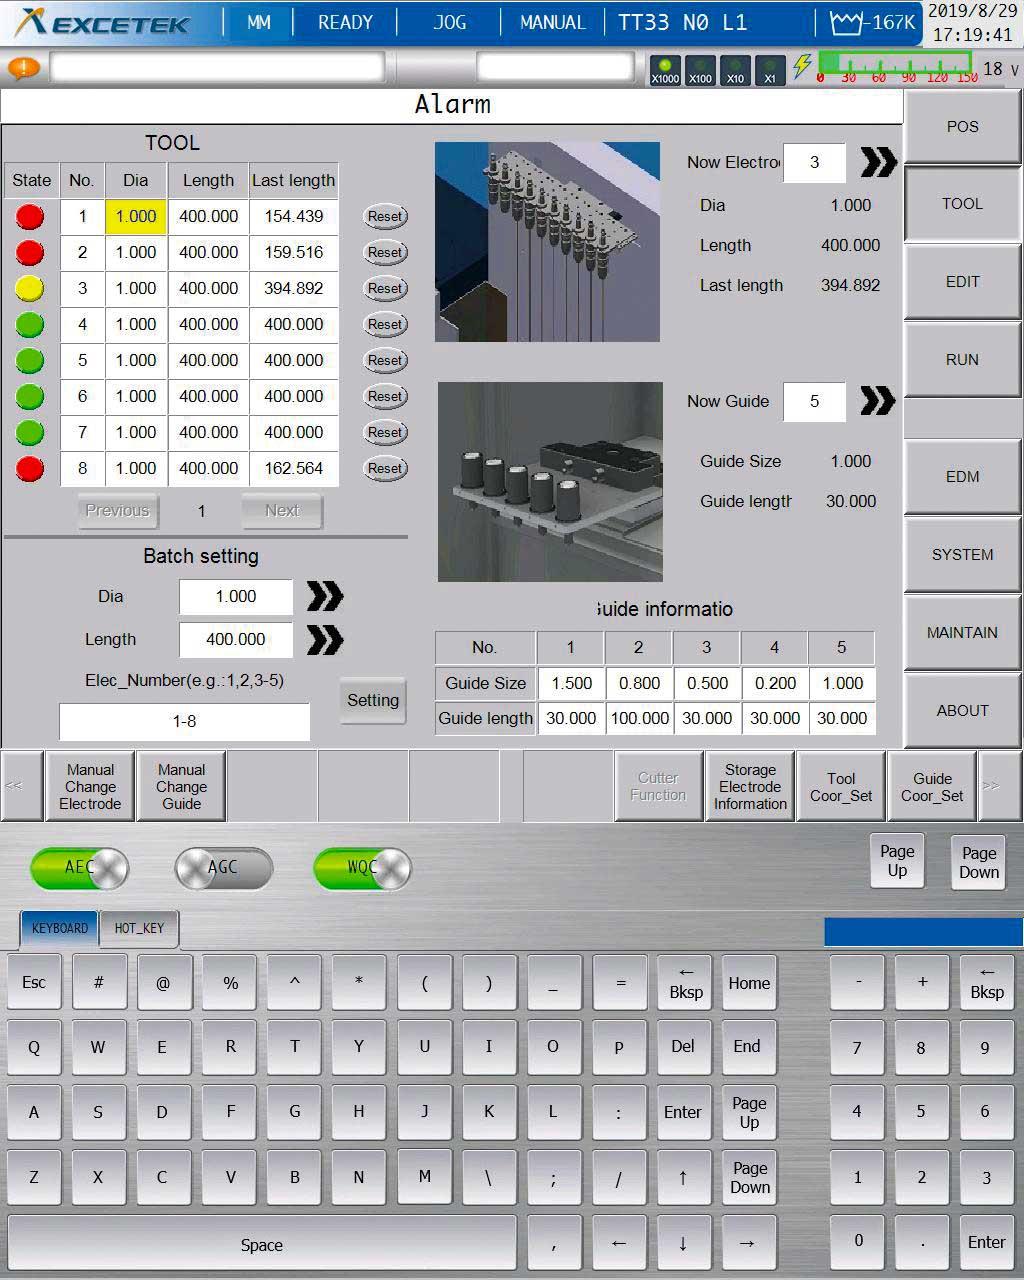 CNC Display of Excetek HD Superdrills